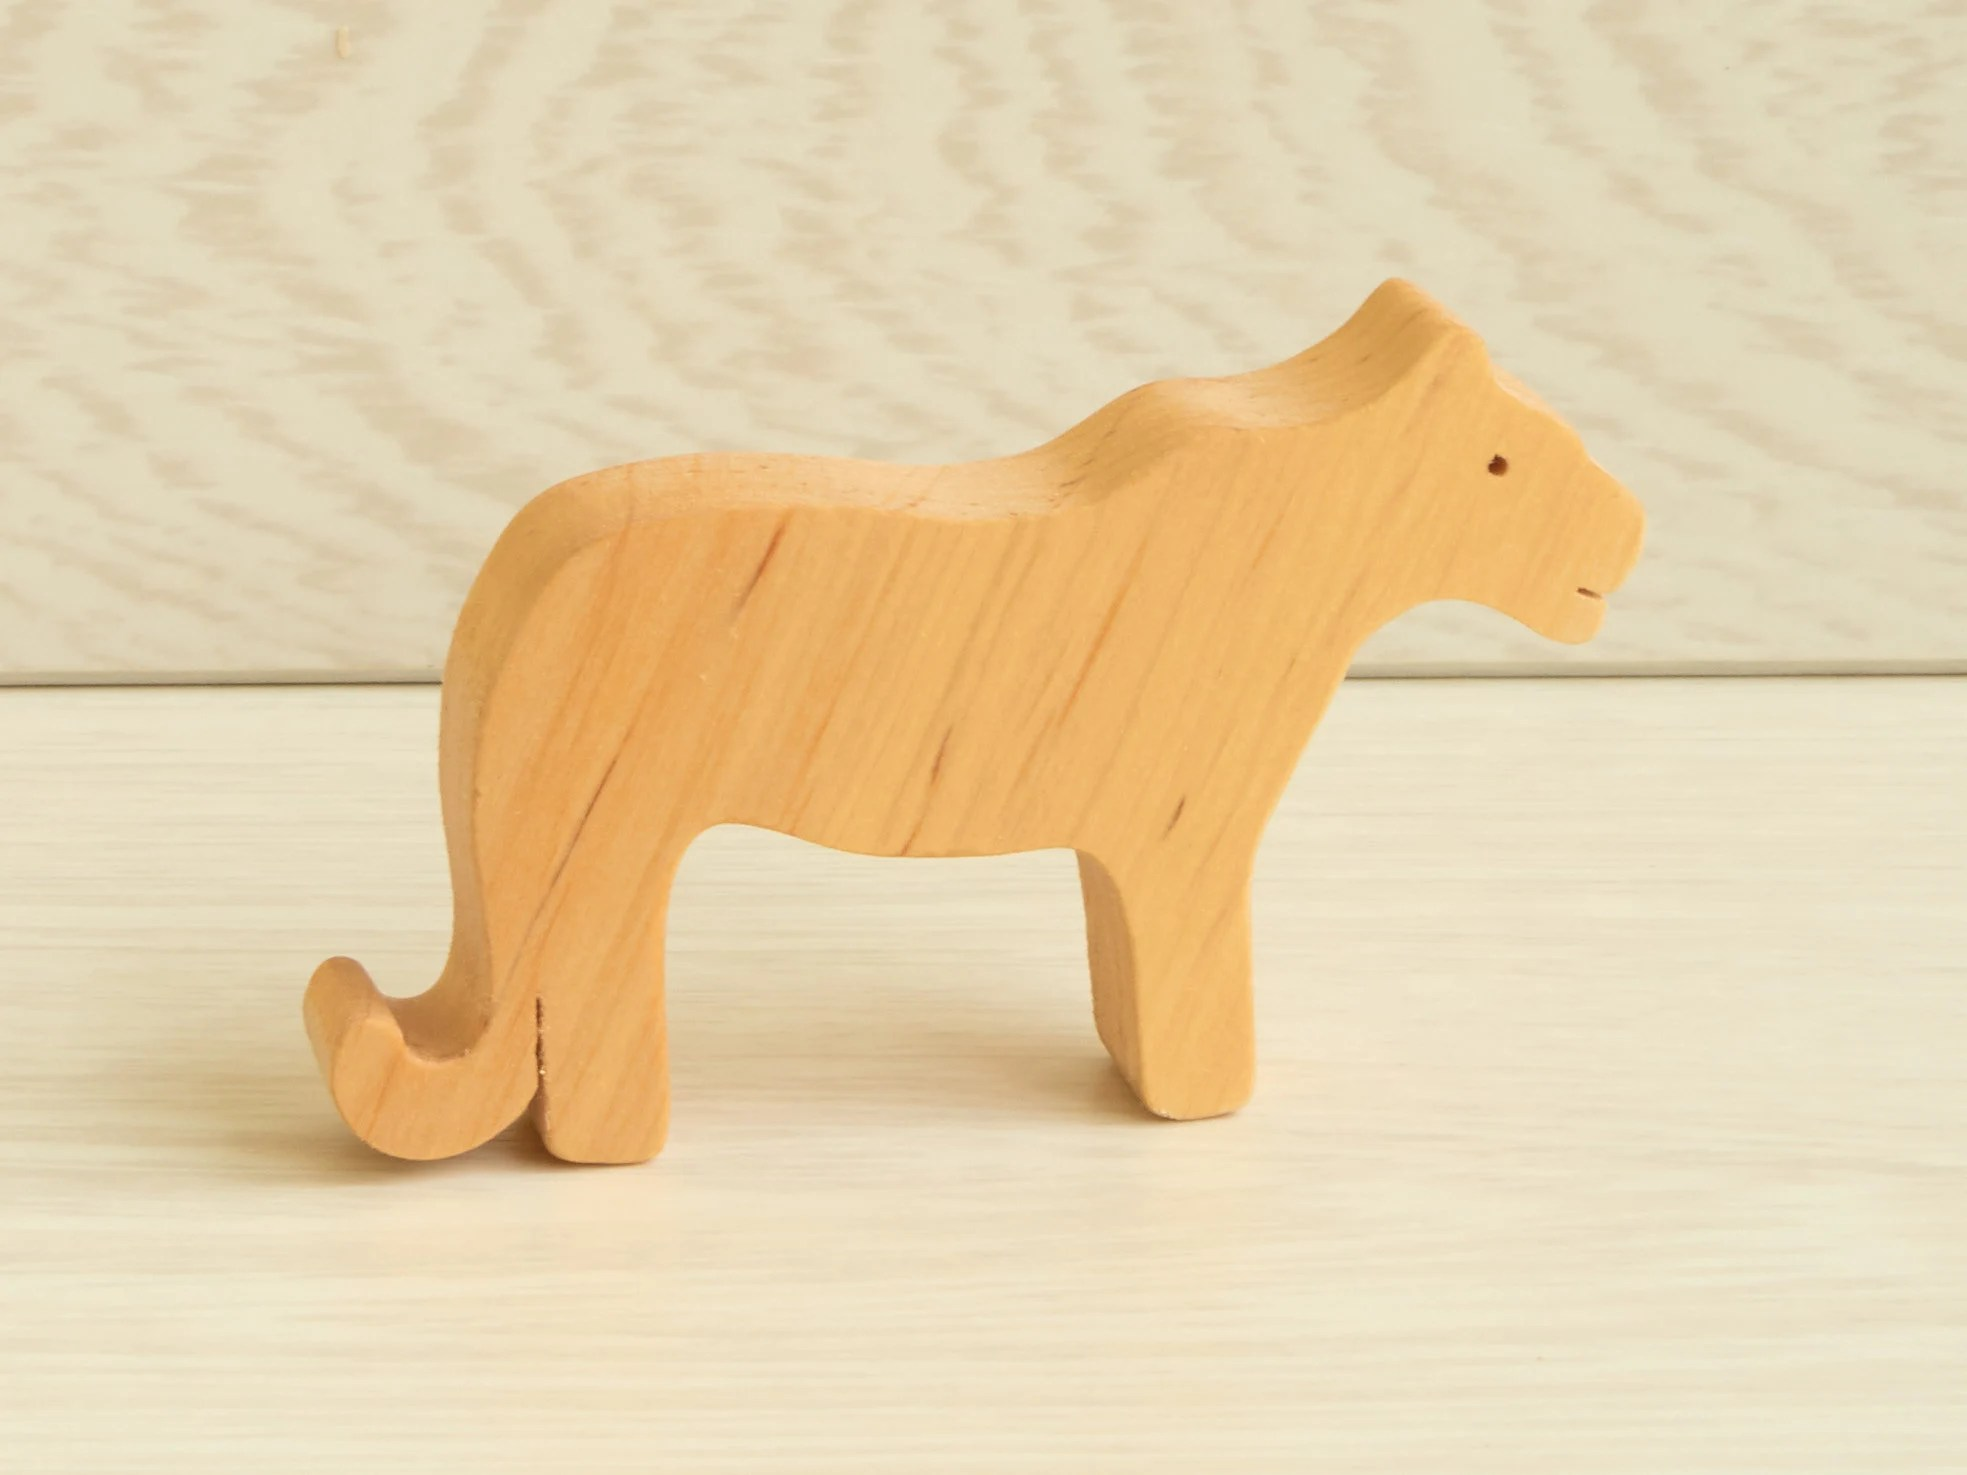 Wooden Toy Set Baby Animal Play Set Organic Wood Toys image 3